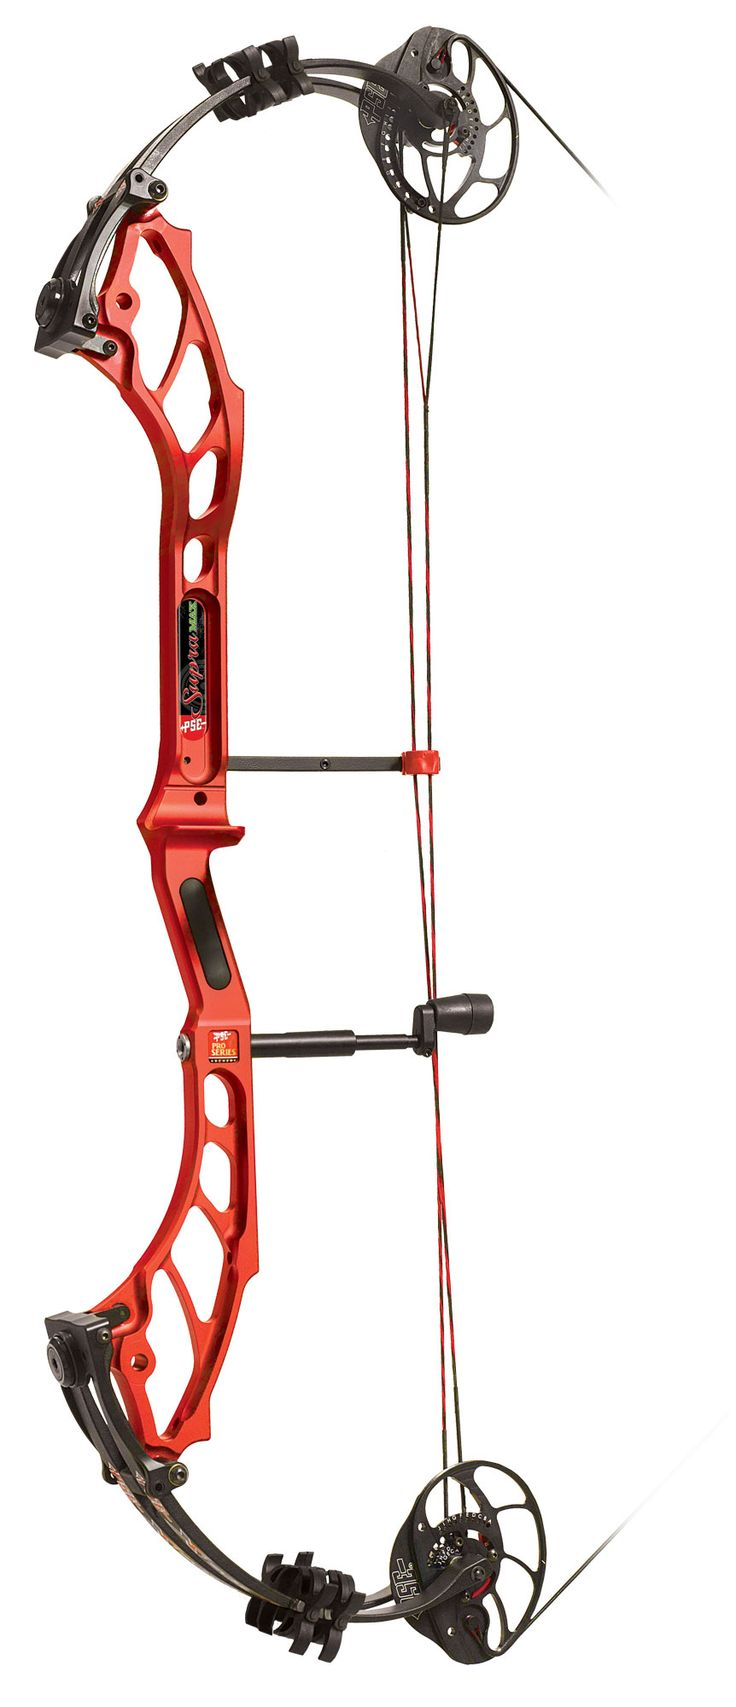 PSE Supra Max Compound Bow - pse-archery.com